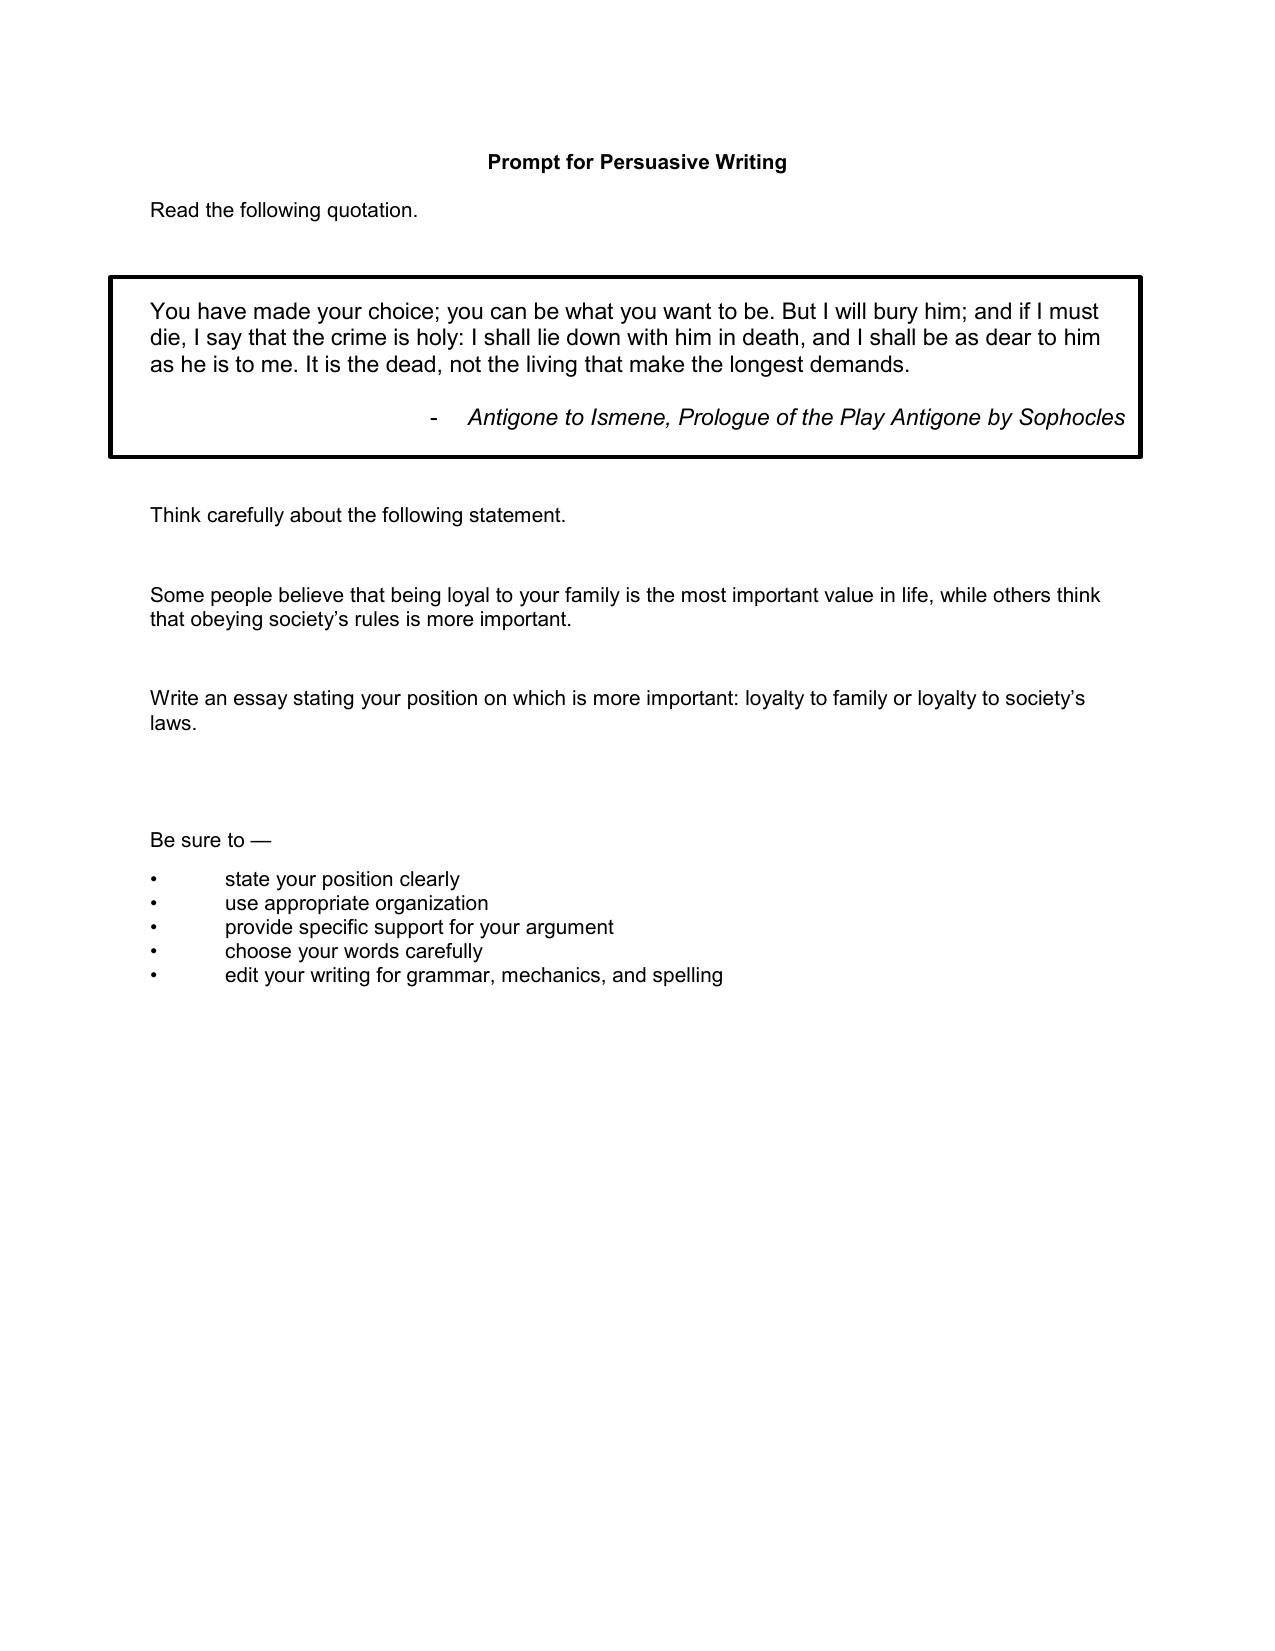 Dissertation writing services usa jobs application